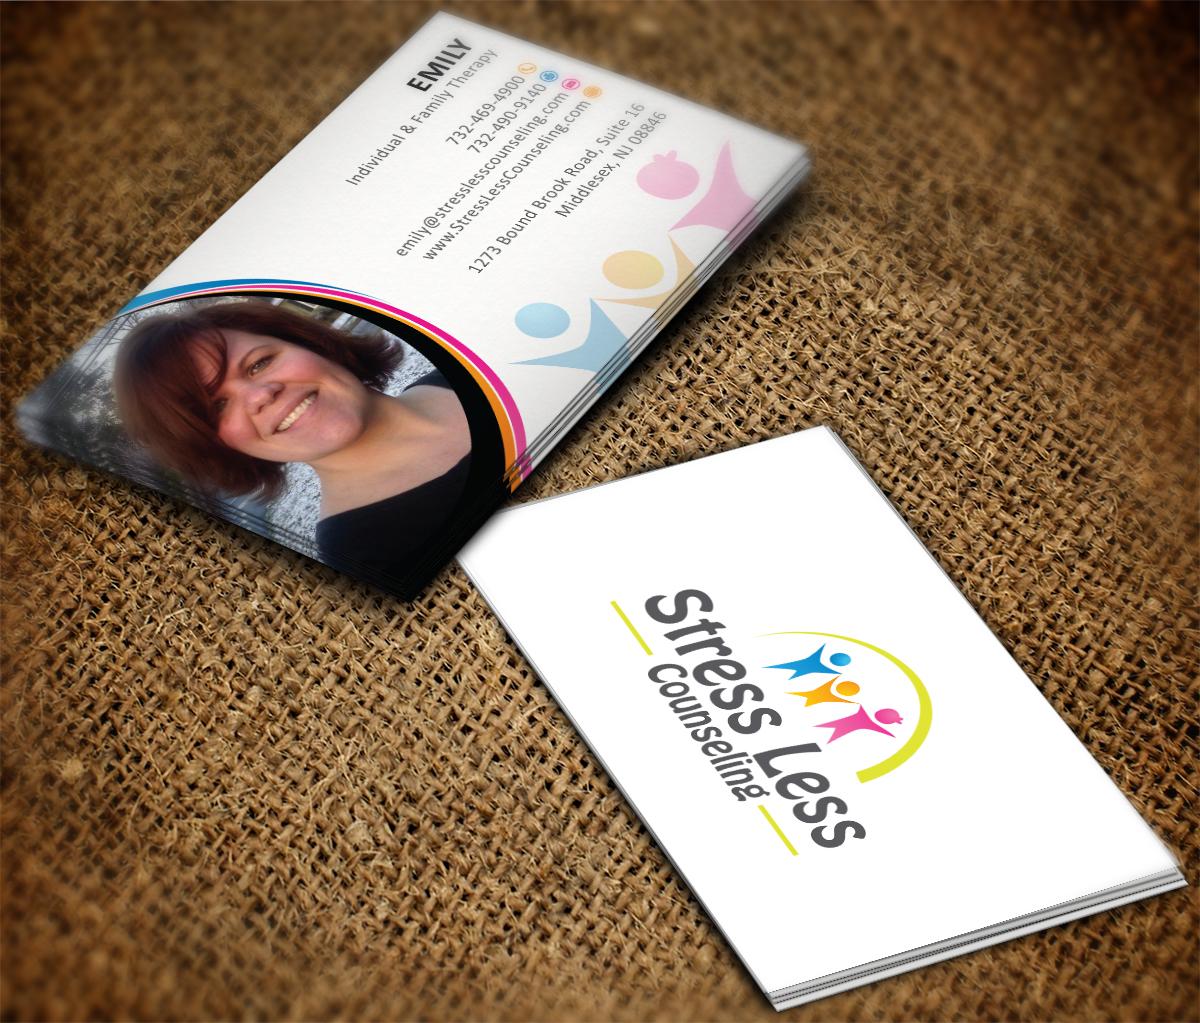 Elegant playful business card design for emily raphel by mt business card design by mt for psychotherapy business card design design 10491564 magicingreecefo Gallery